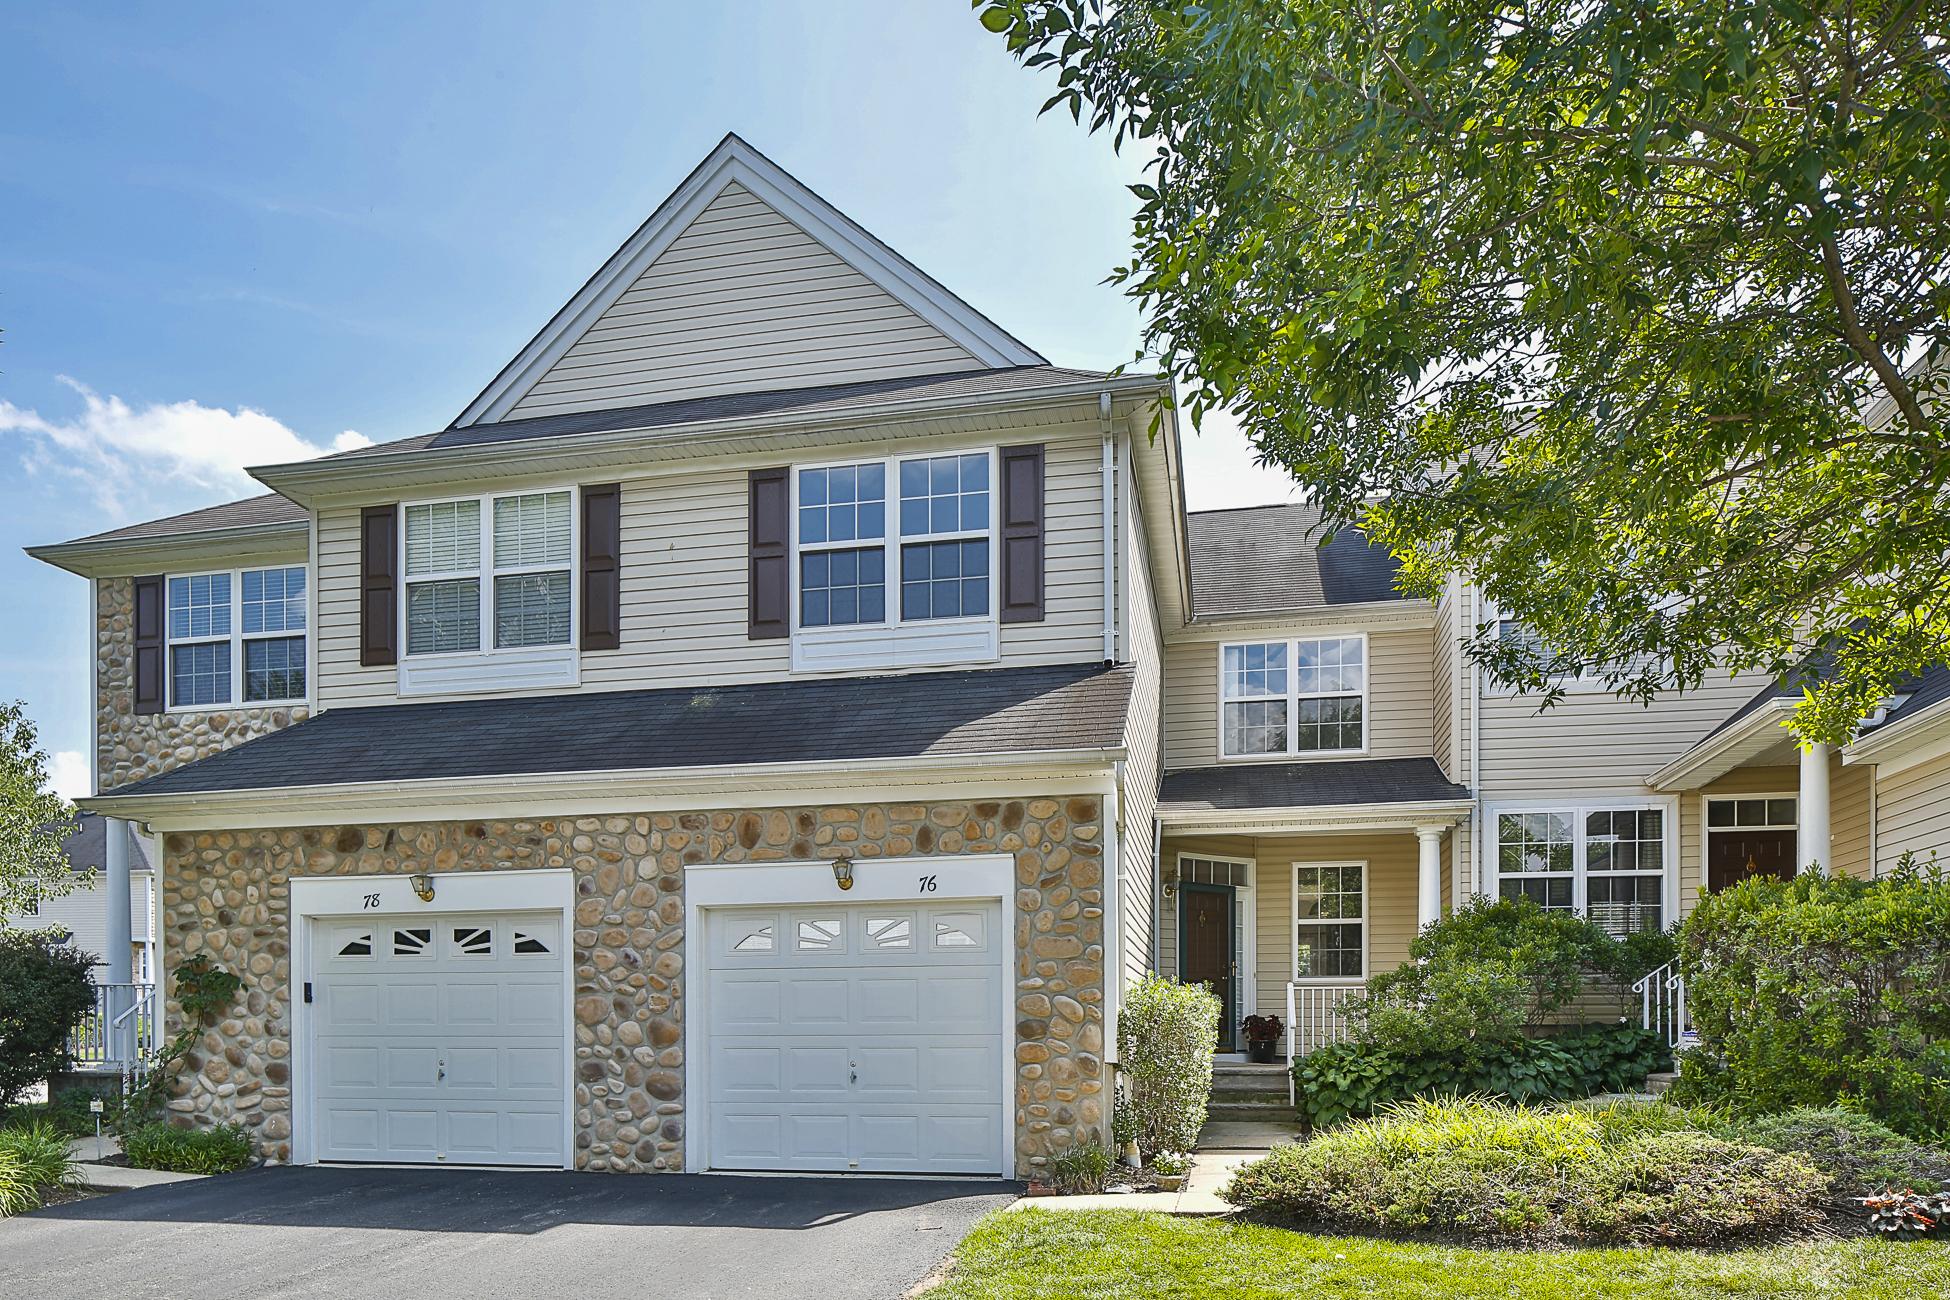 联栋屋 为 销售 在 Open, Airy And Pleasantly Neutral - Montgomery Township 76 River Birch Circle Princeton, 新泽西州 08540 美国